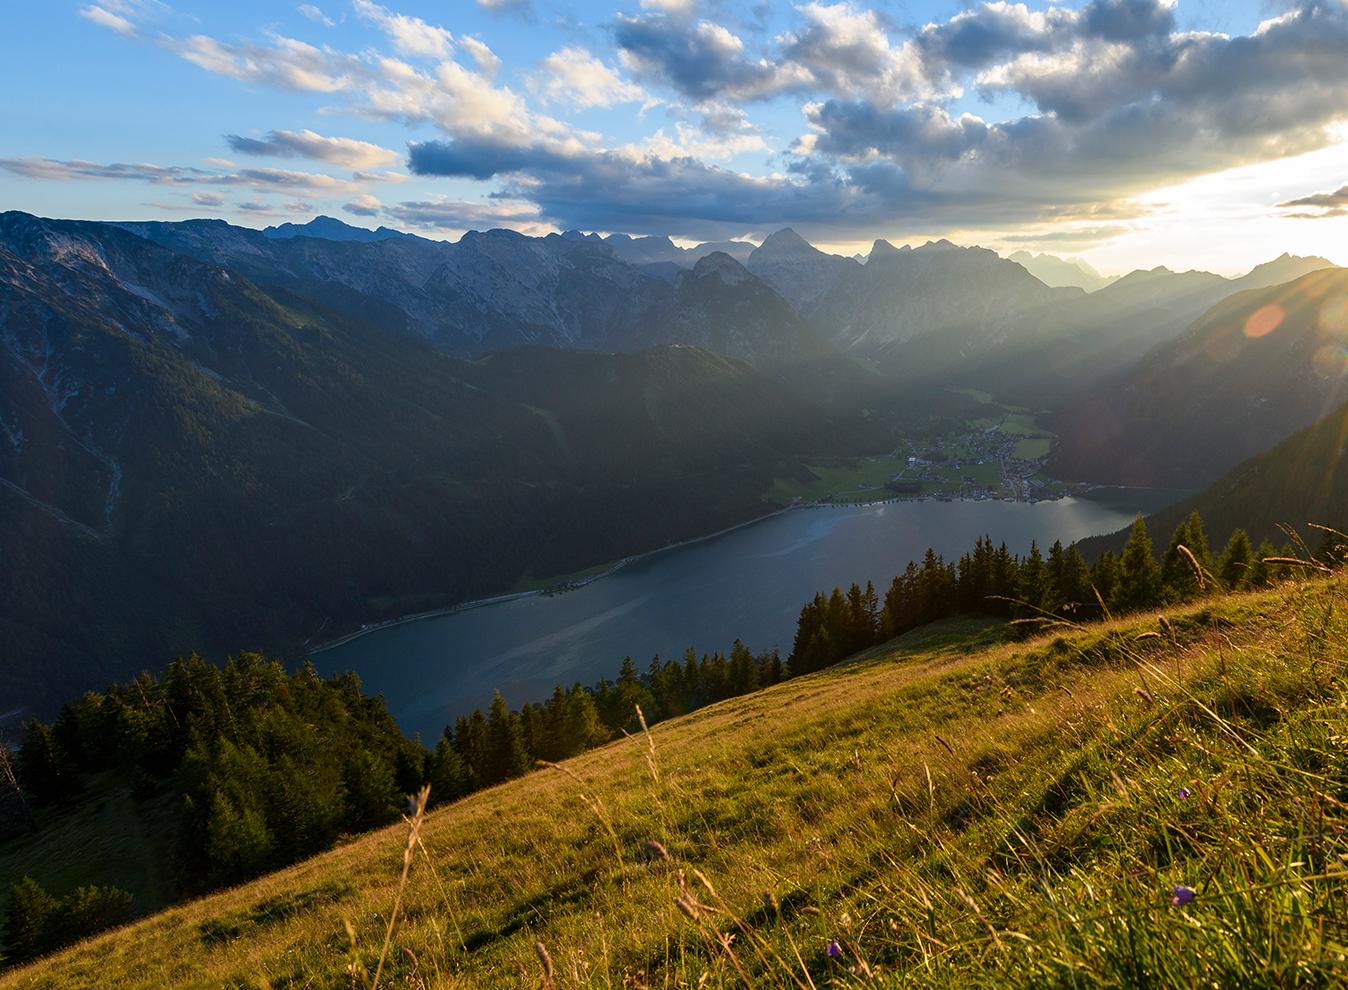 Der Herbst im Rofan, Foto: Achensee Tourismus | Climbers Paradise